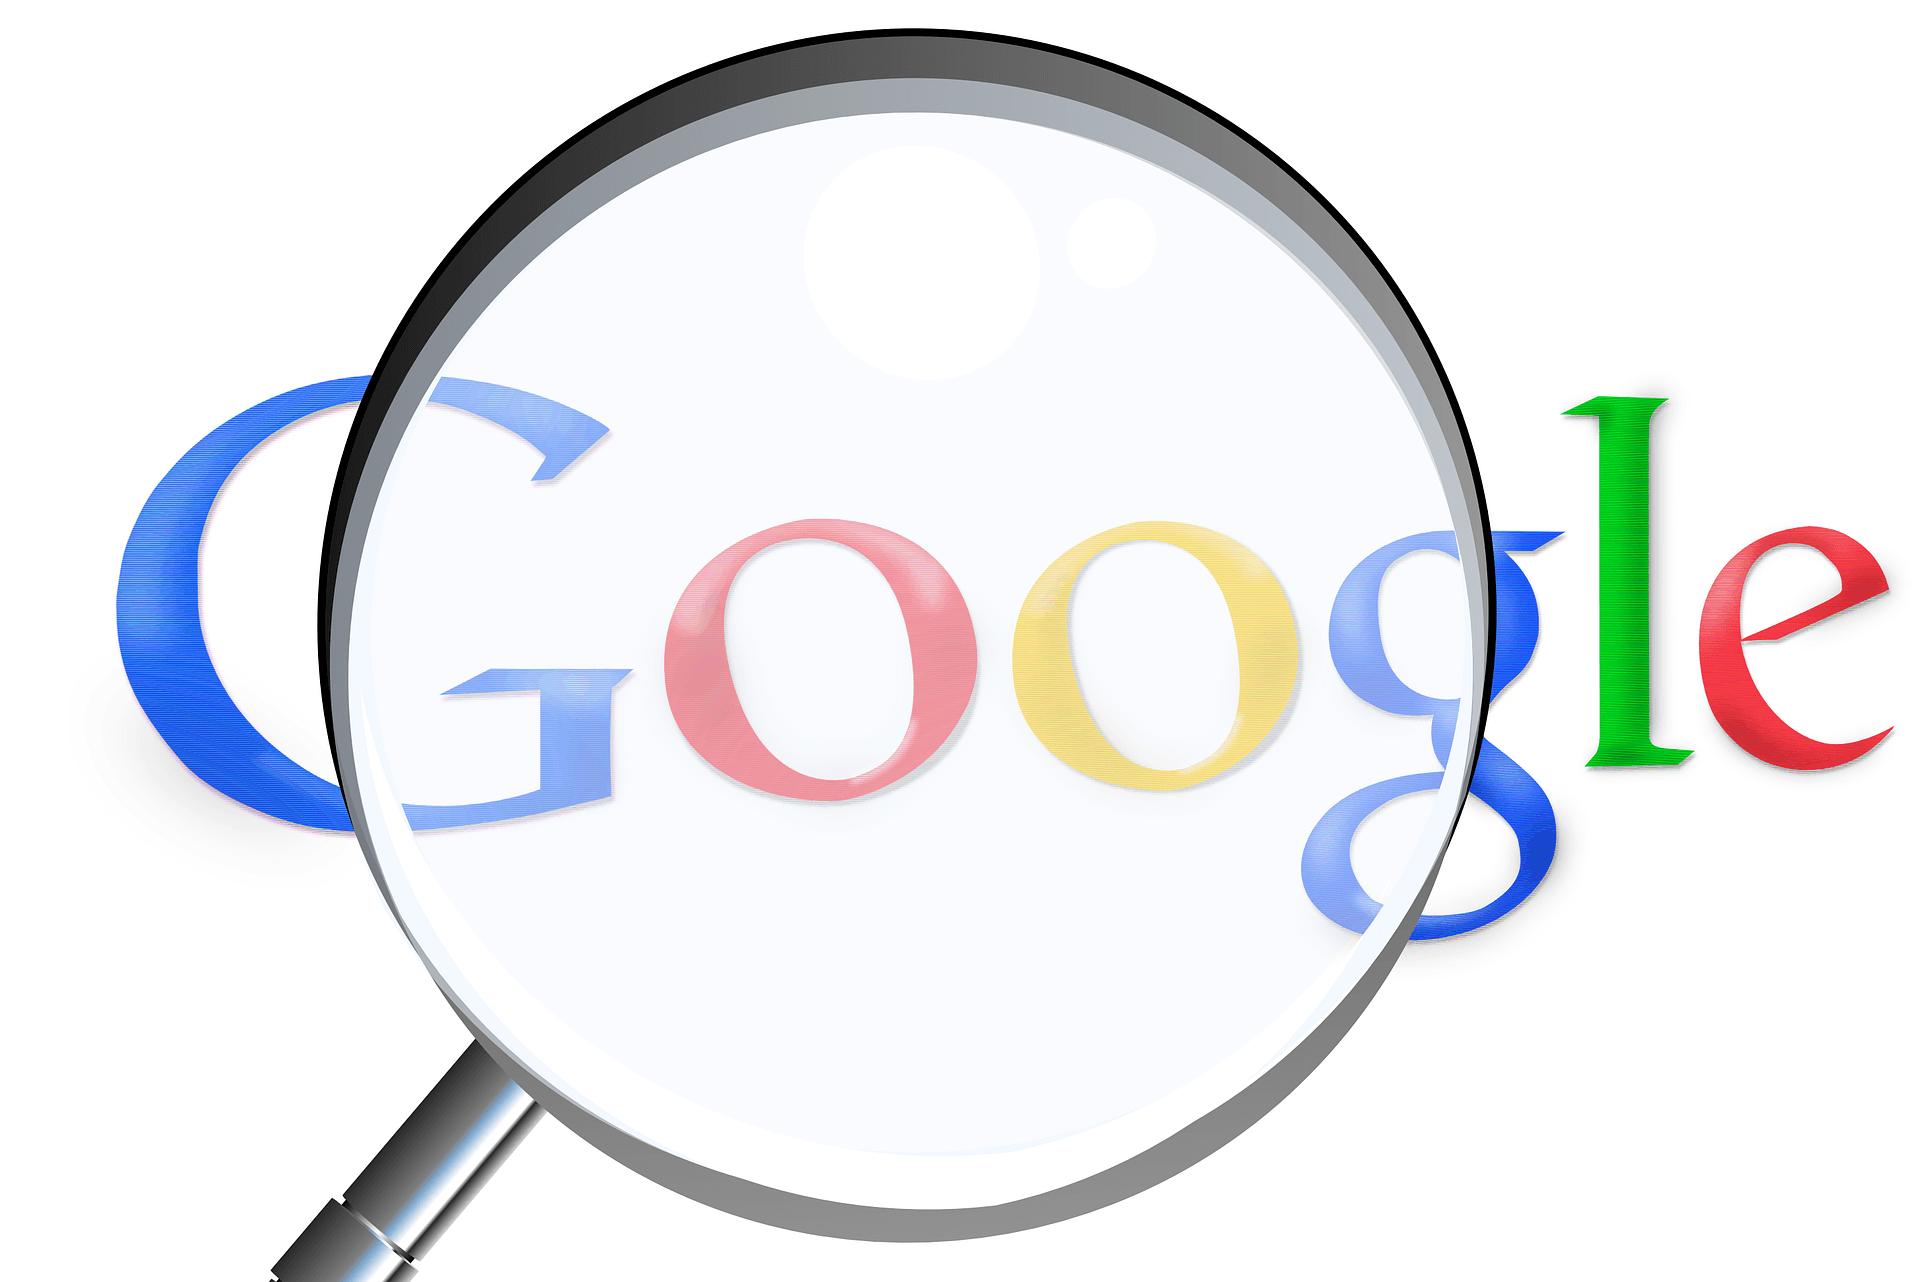 Google Online Marketing Yoga ©magnifying-glass-76520/Pixabay